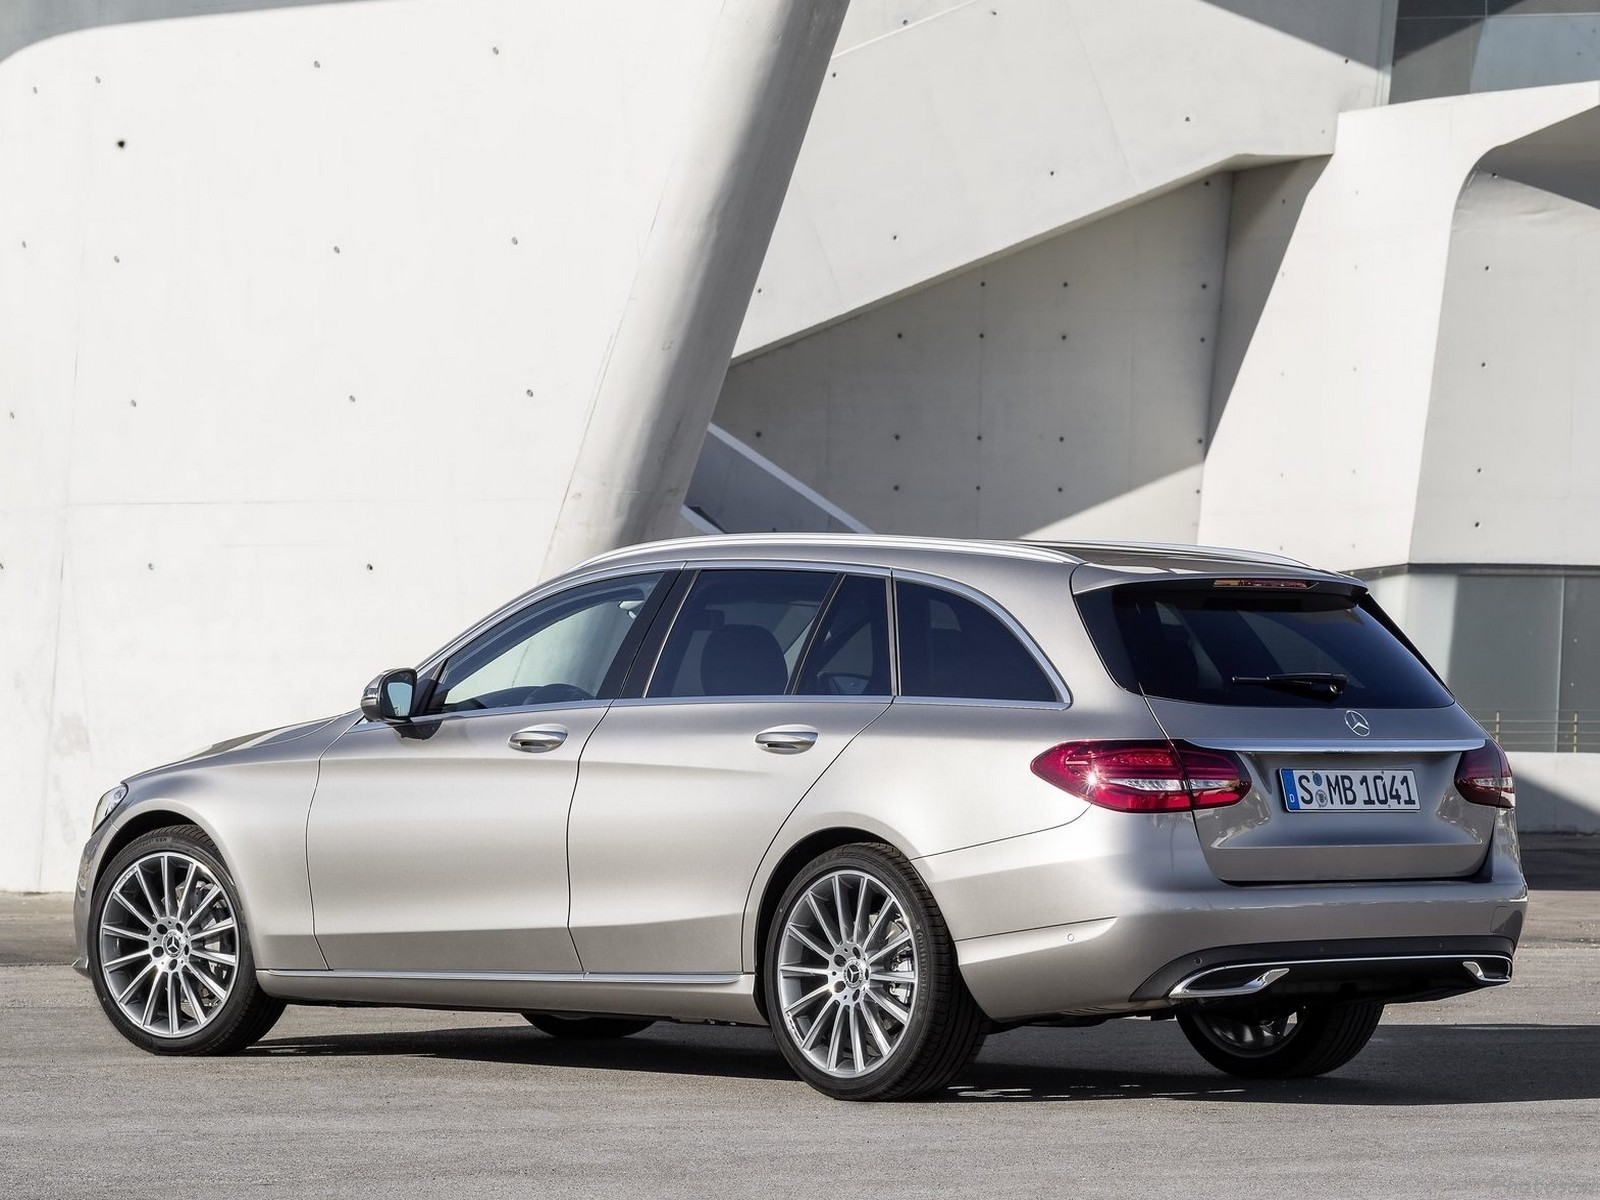 Mercedes Classe C Estate 2019 - 02